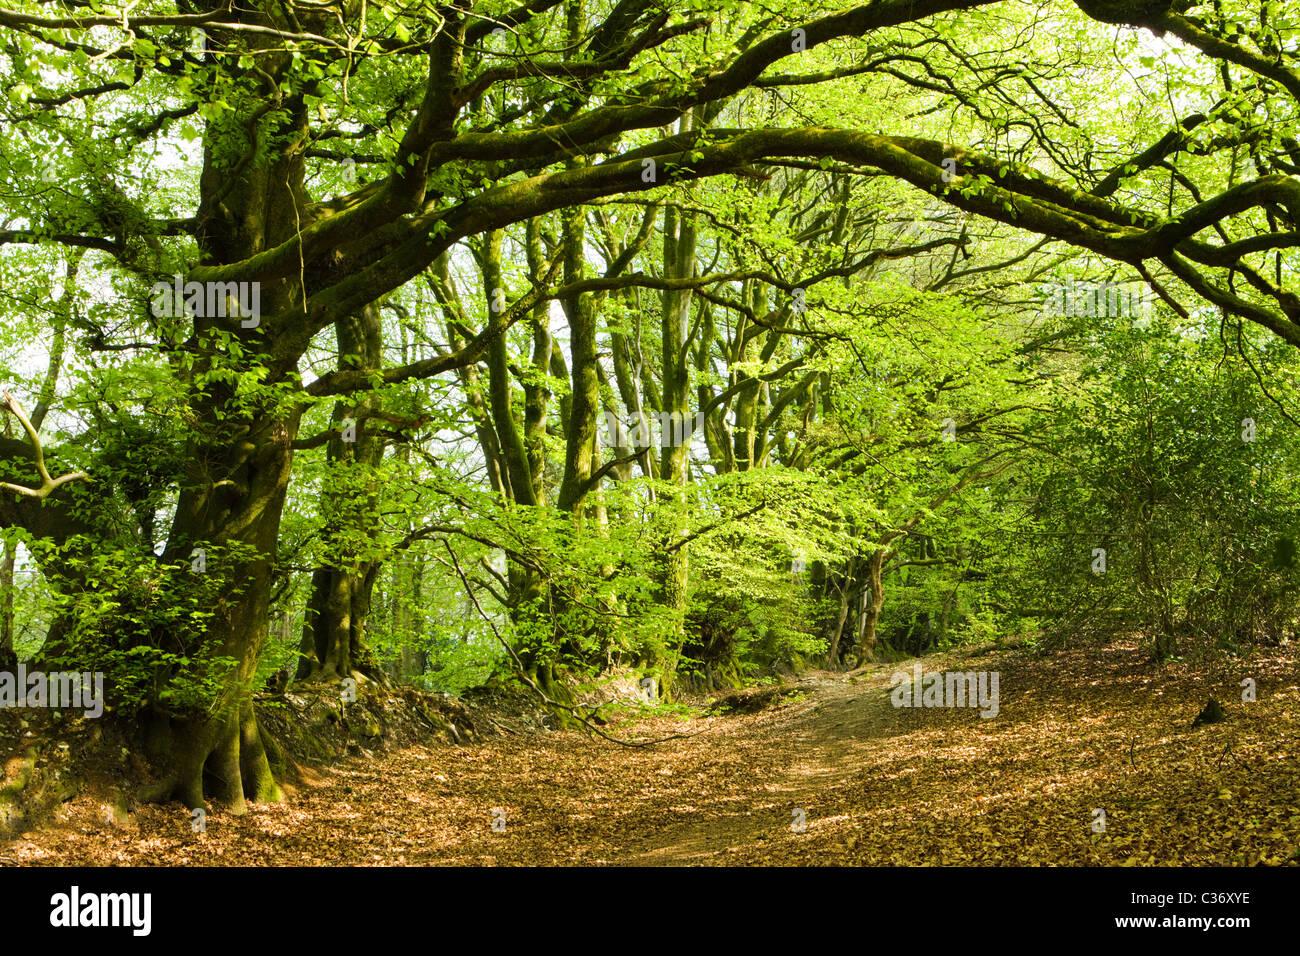 Madera Dommett, Somerset, Reino Unido. Hayedos. Imagen De Stock